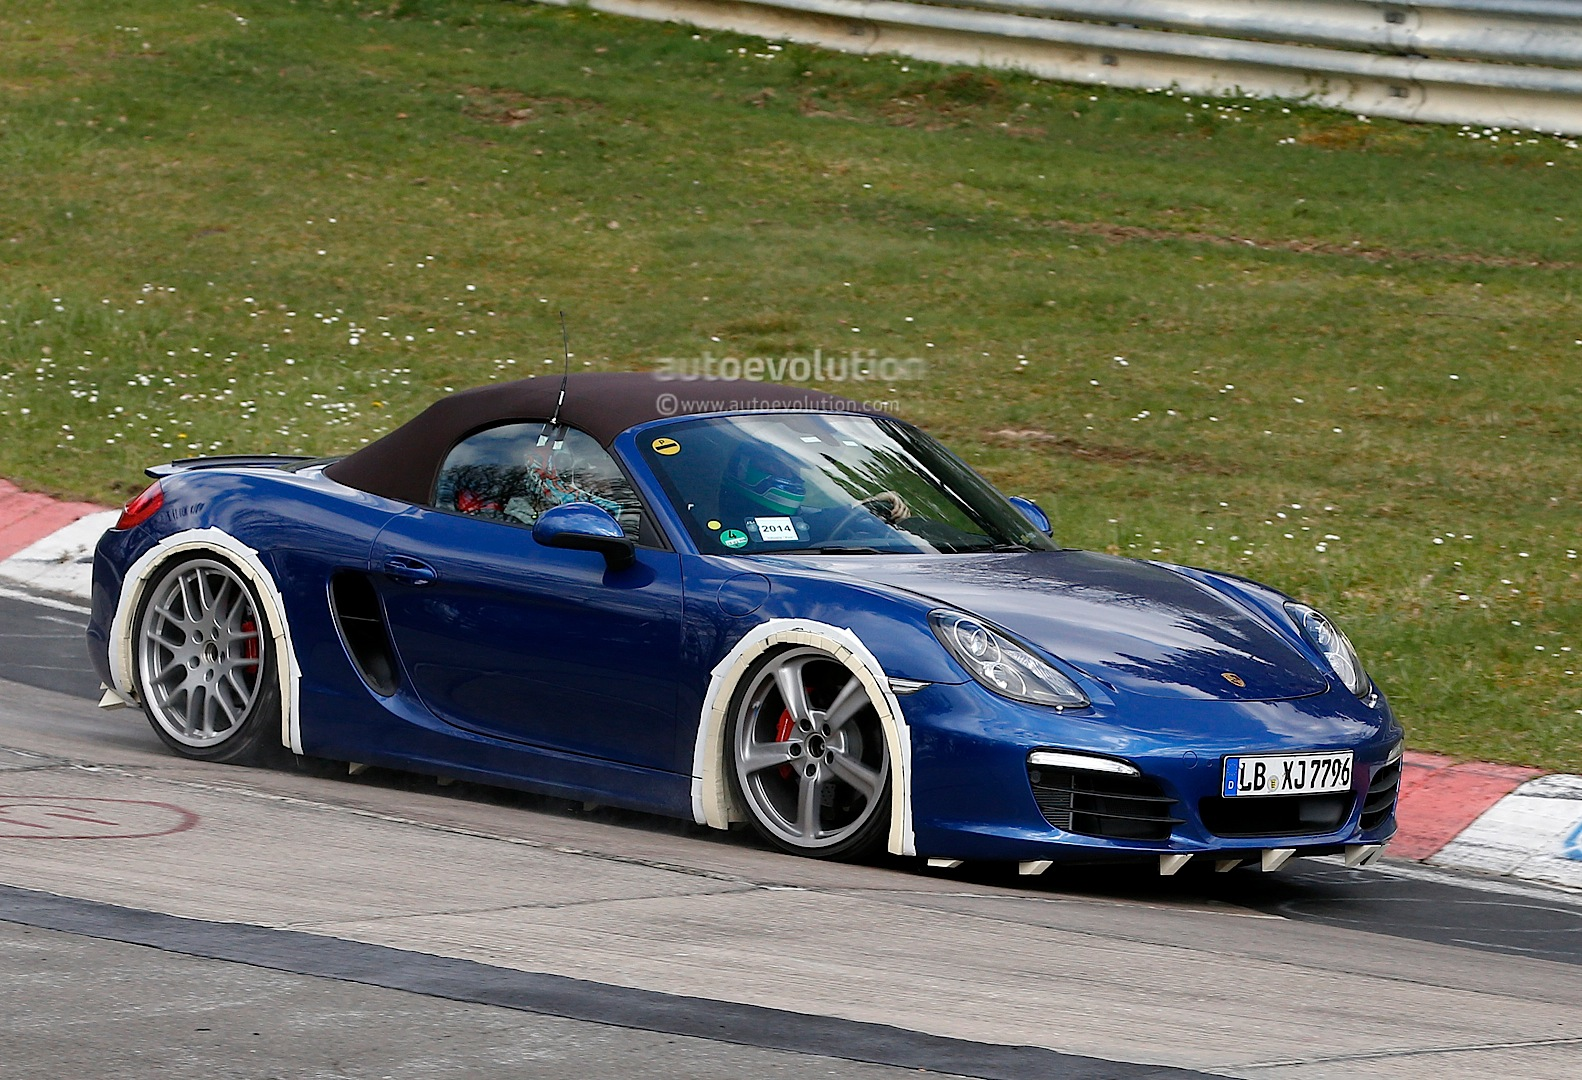 Spyshots Porsche Boxster 4 Cylinder Turbo Testing Begins